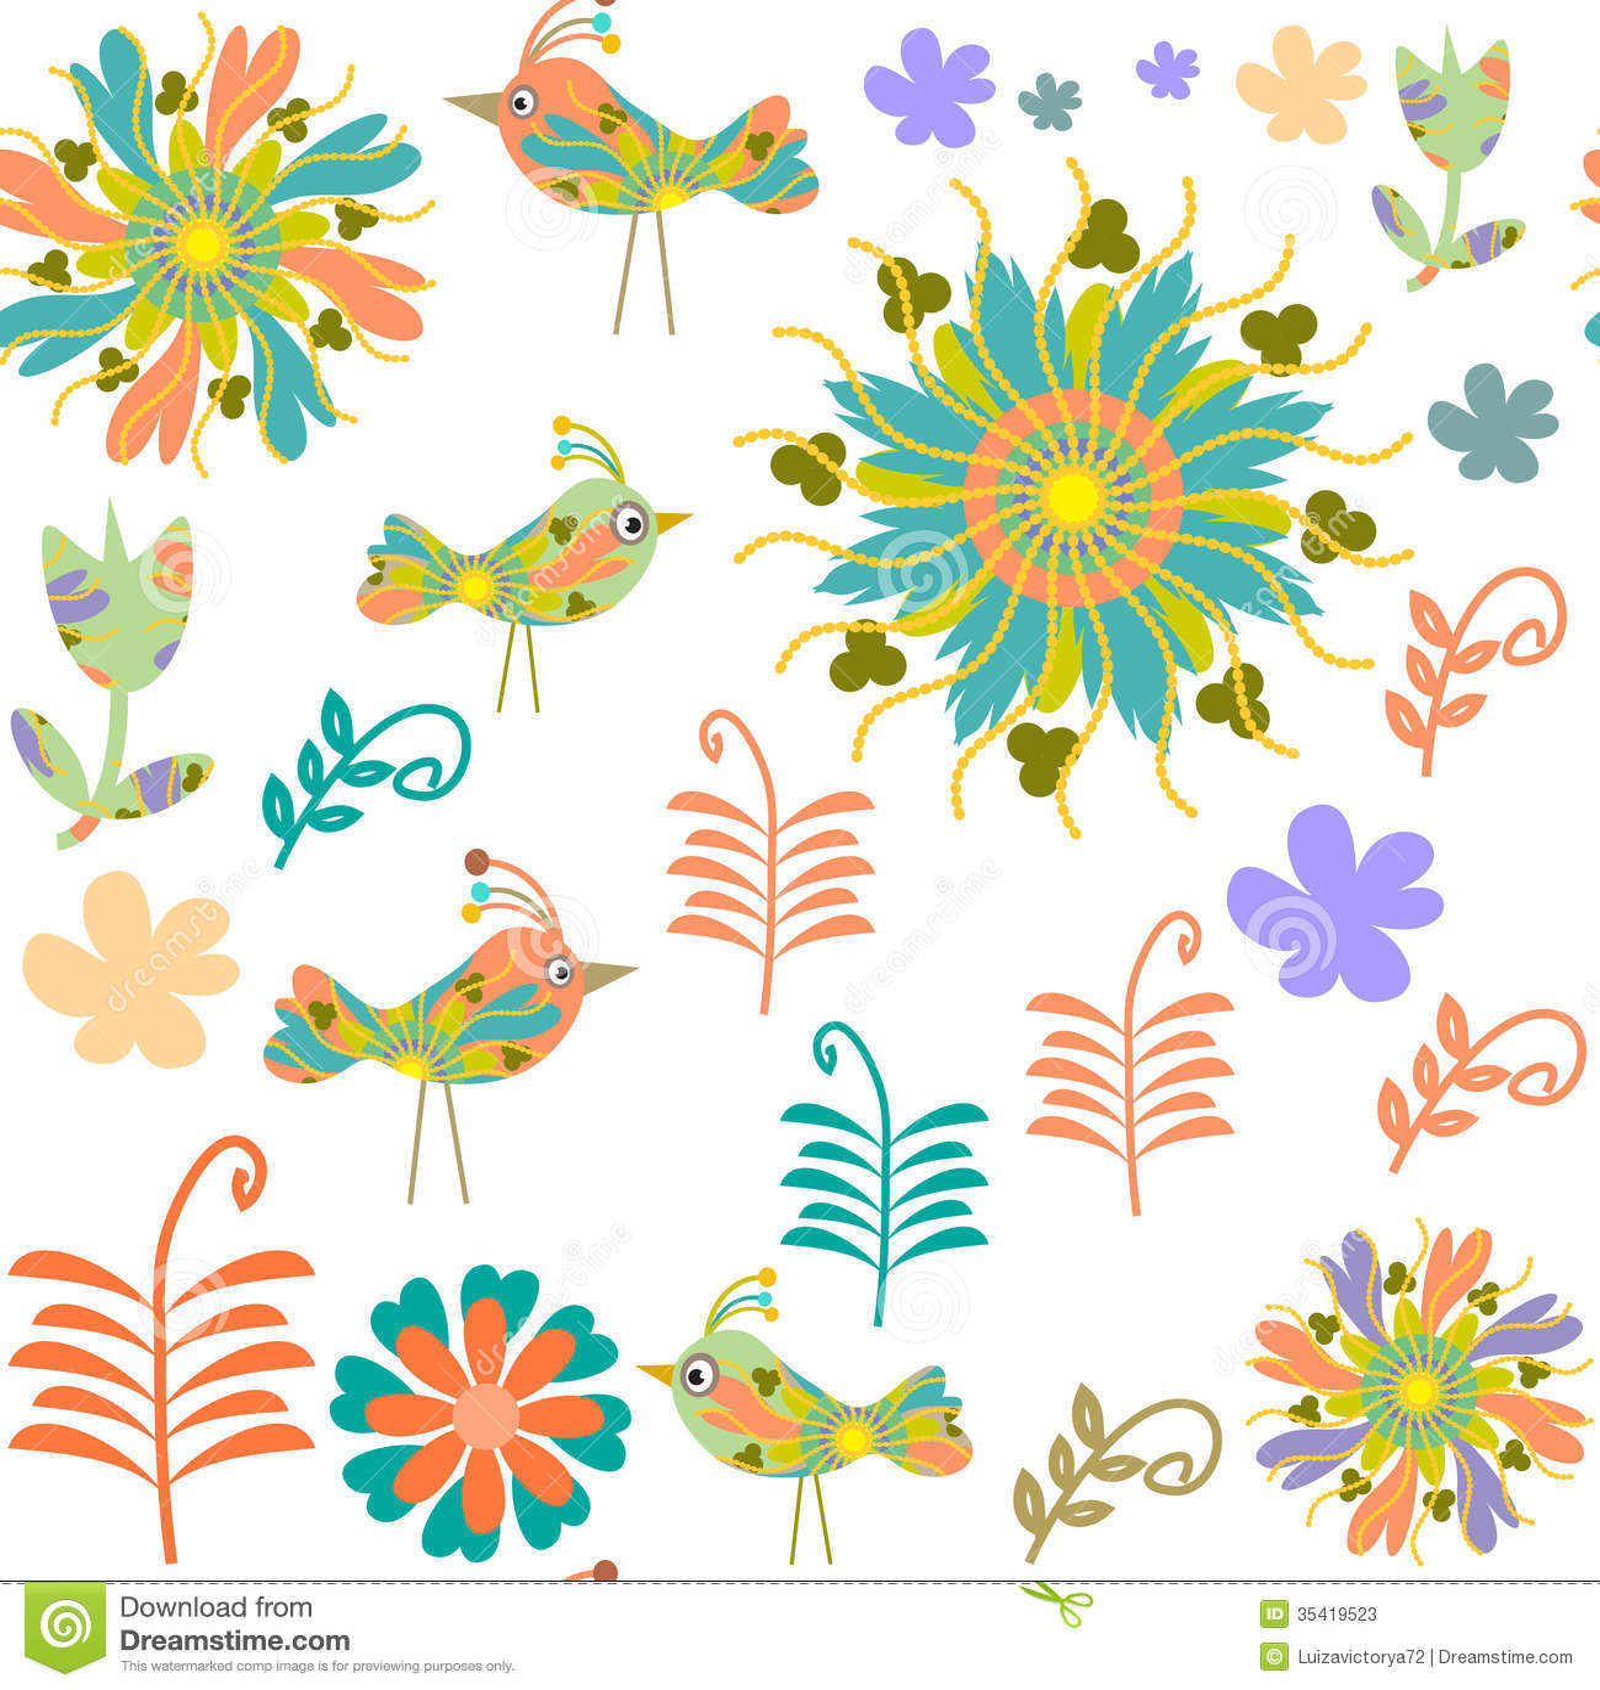 vintage style wallpaper birds